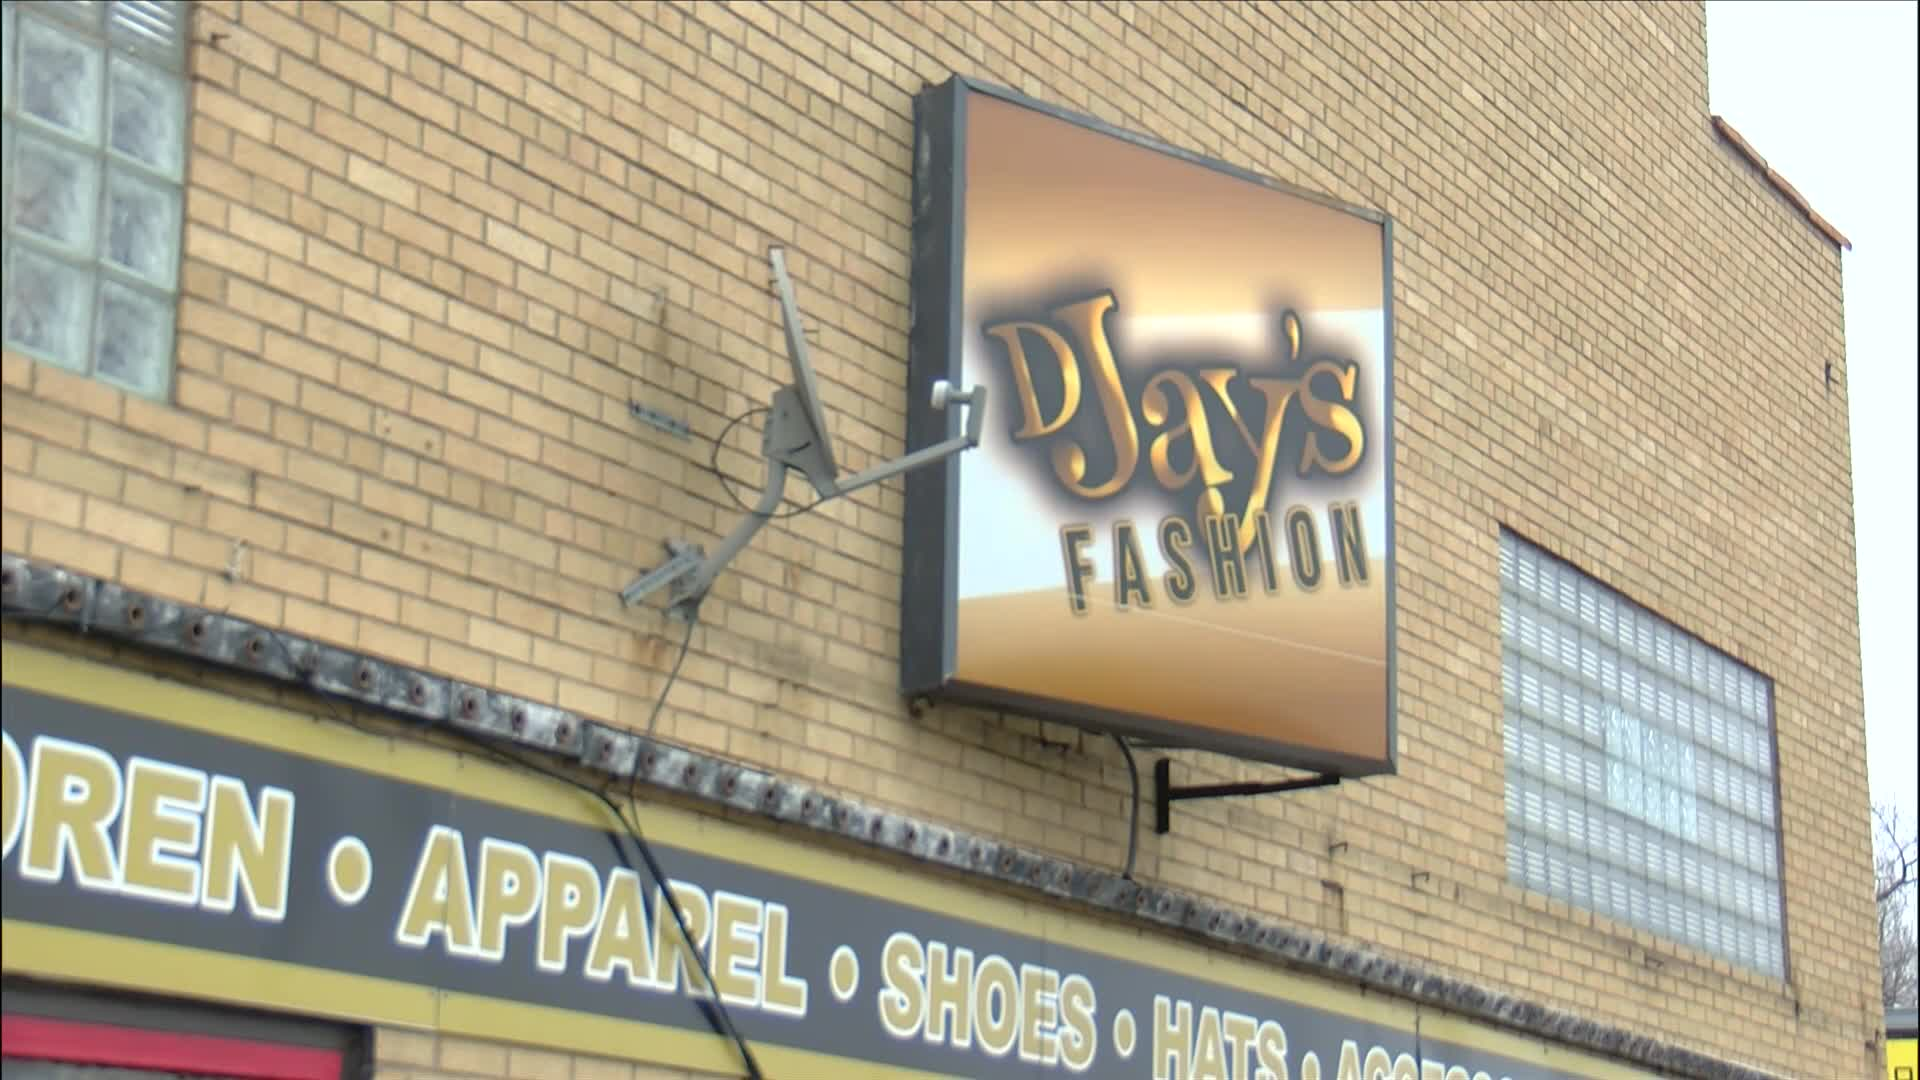 DJays Fashion store front